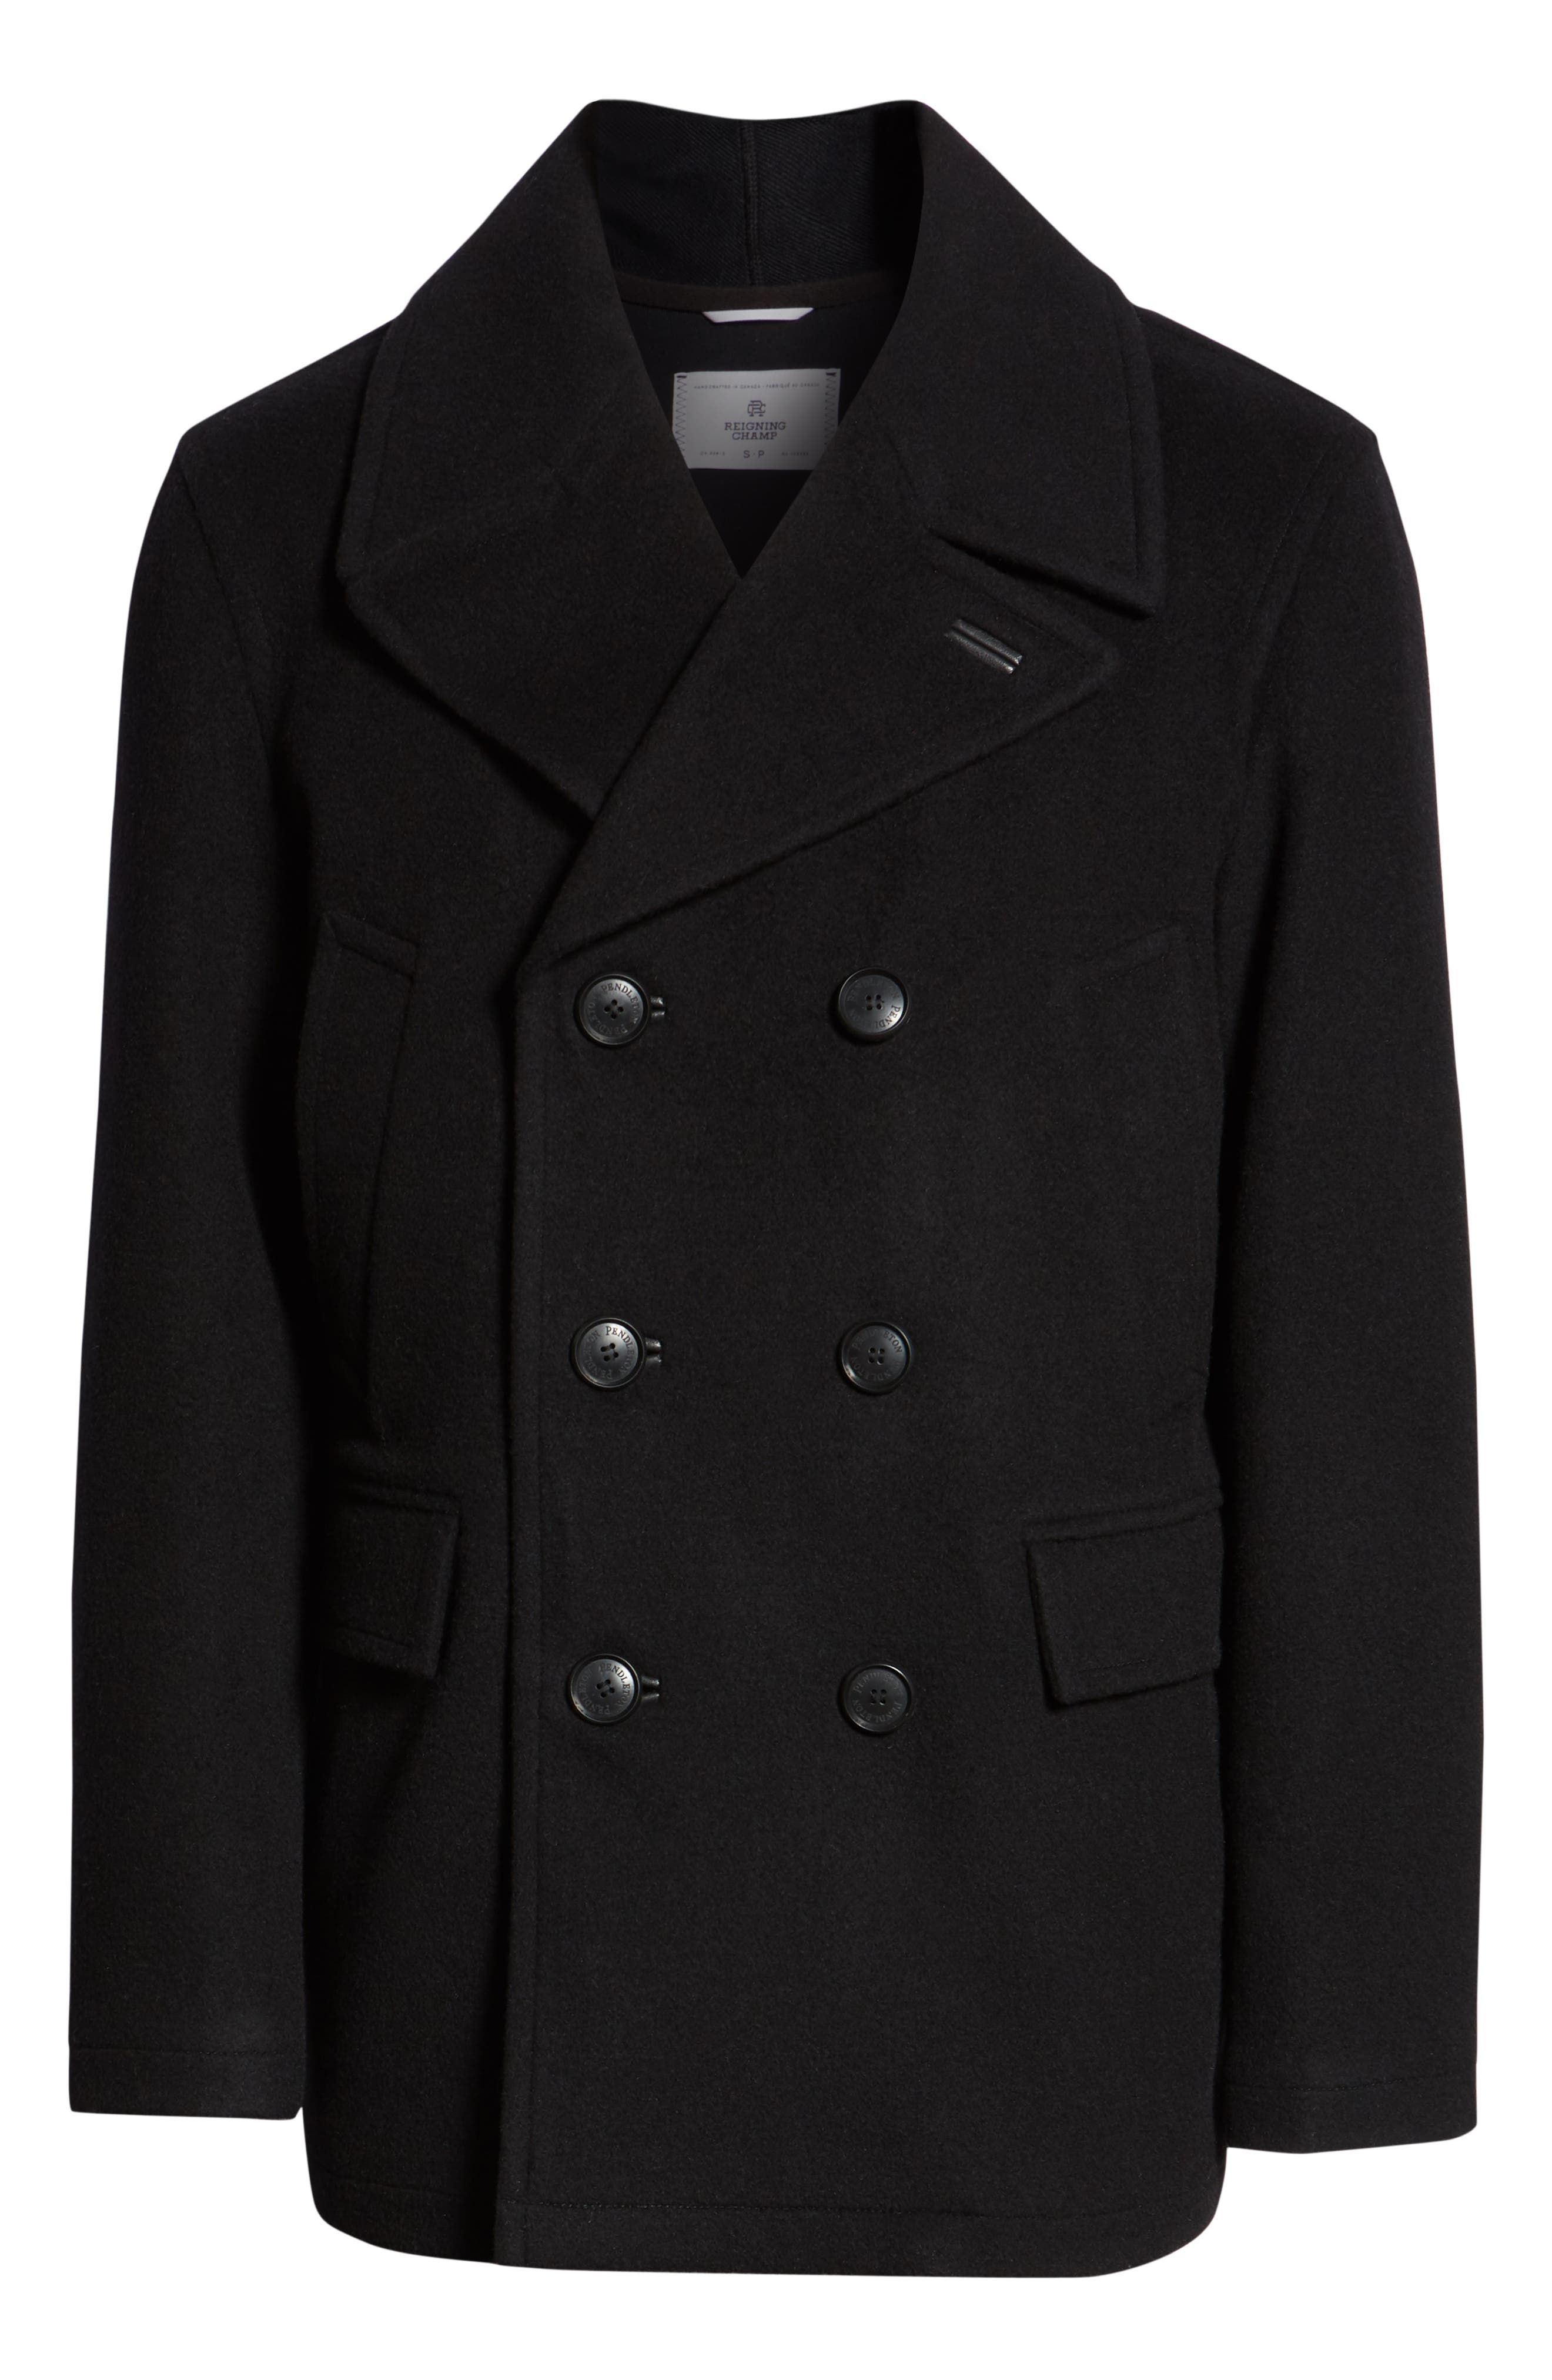 PENDLETON, Maritime Wool Blend Peacoat, Alternate thumbnail 6, color, BLACK